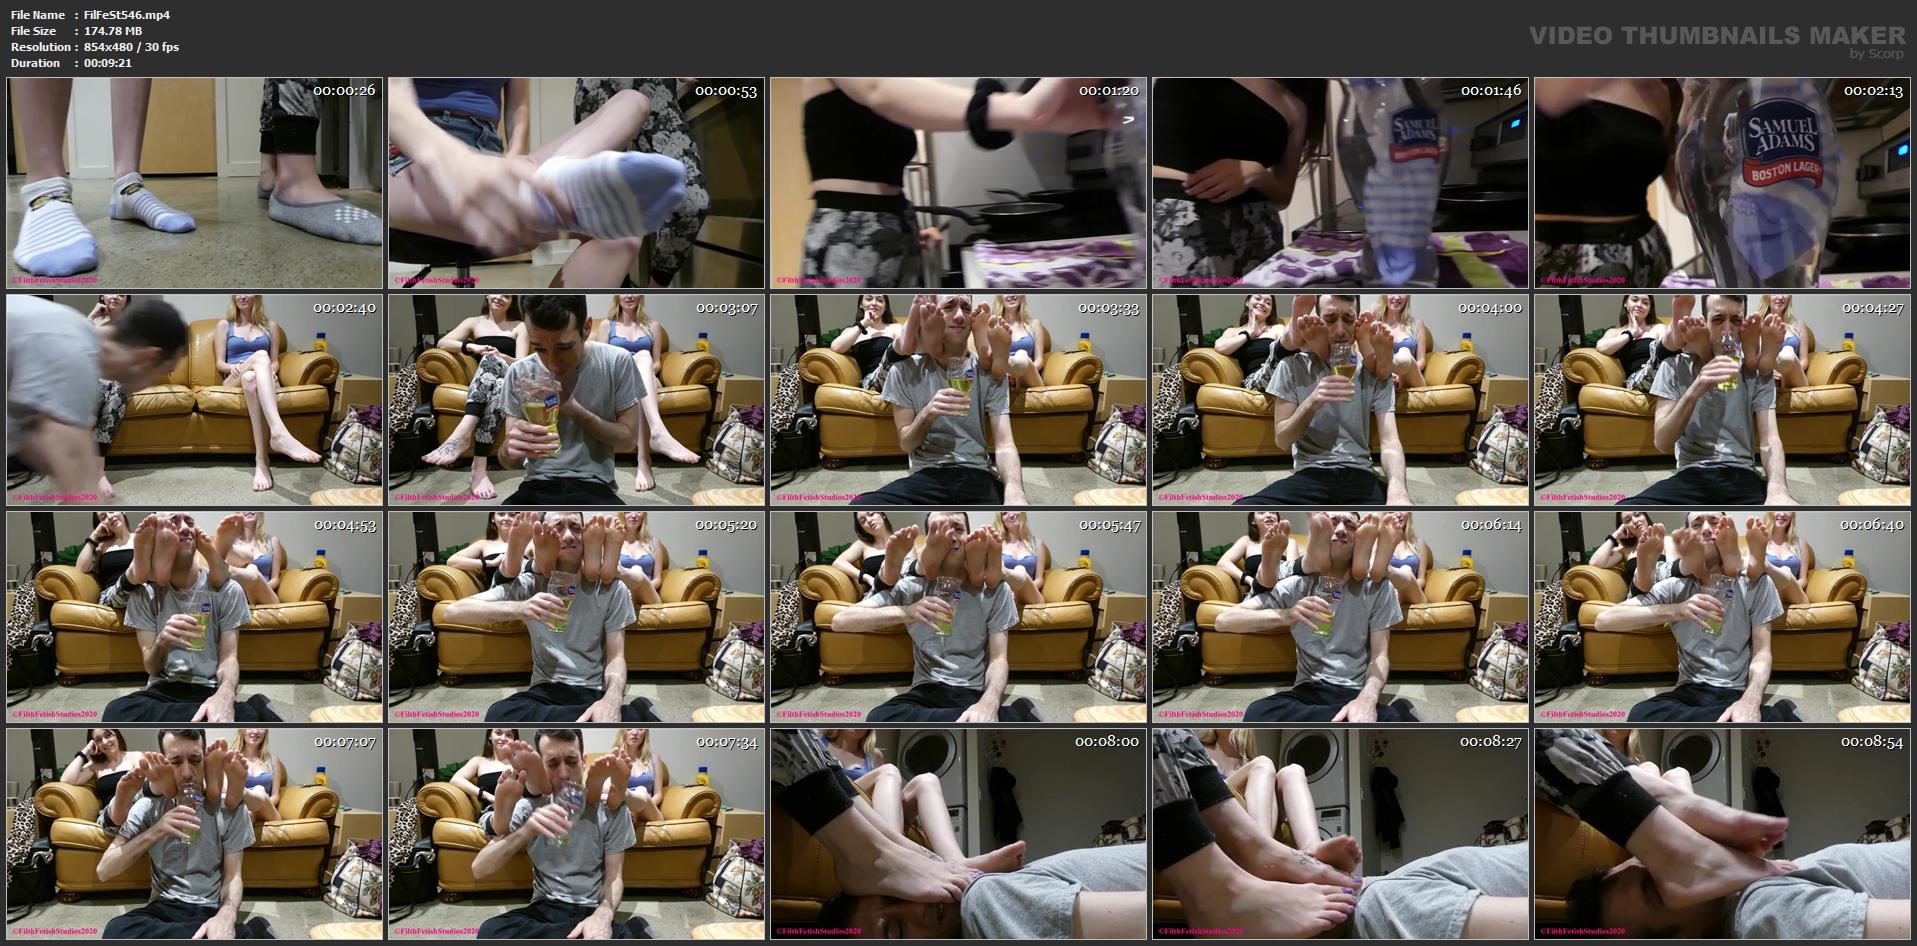 Co-ed Foot Sweat - Princess Violet and Princess Sarah - FILTH FETISH STUDIOS - SD/480p/MP4